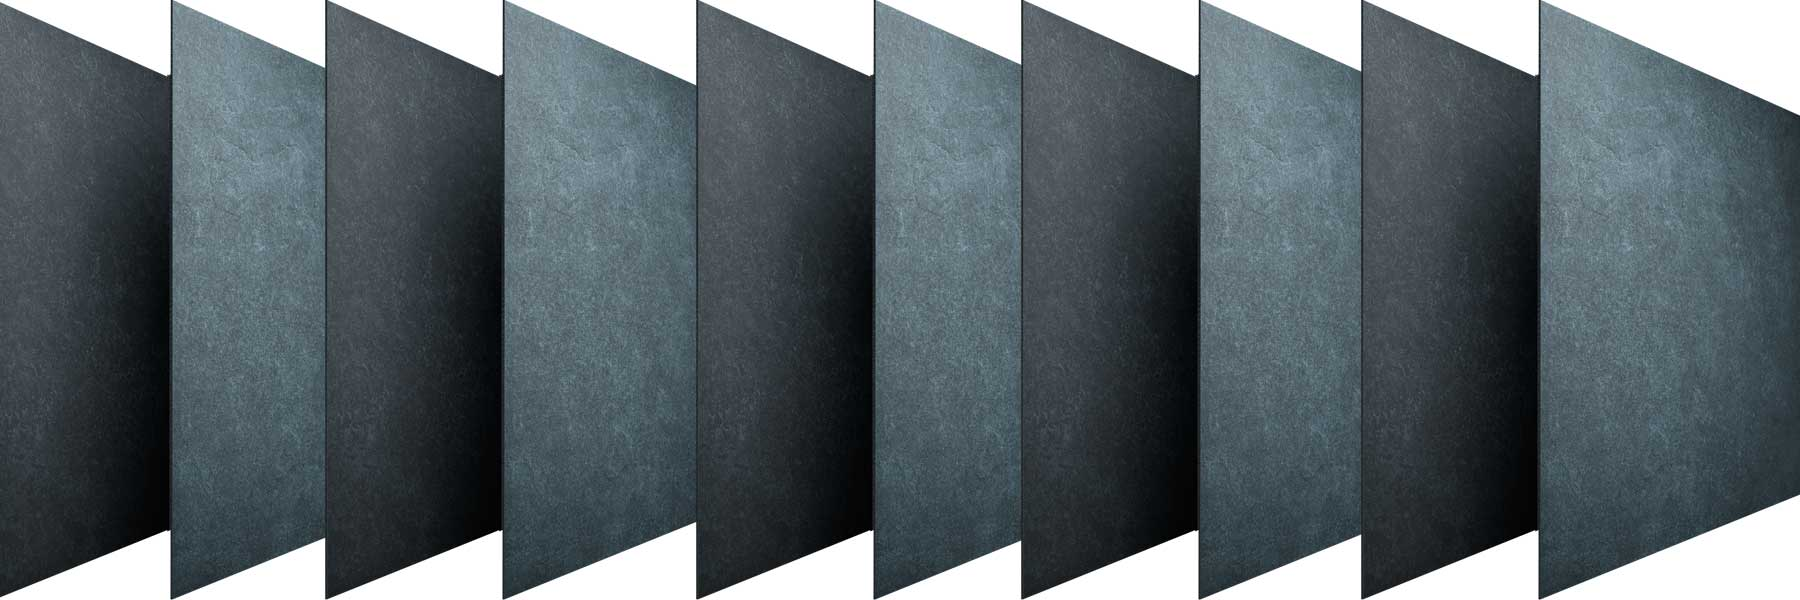 Slider Trespa Meteon Fassadenplatten NA17 Matt Natural Graphite Und N16 Belgian Bluestone